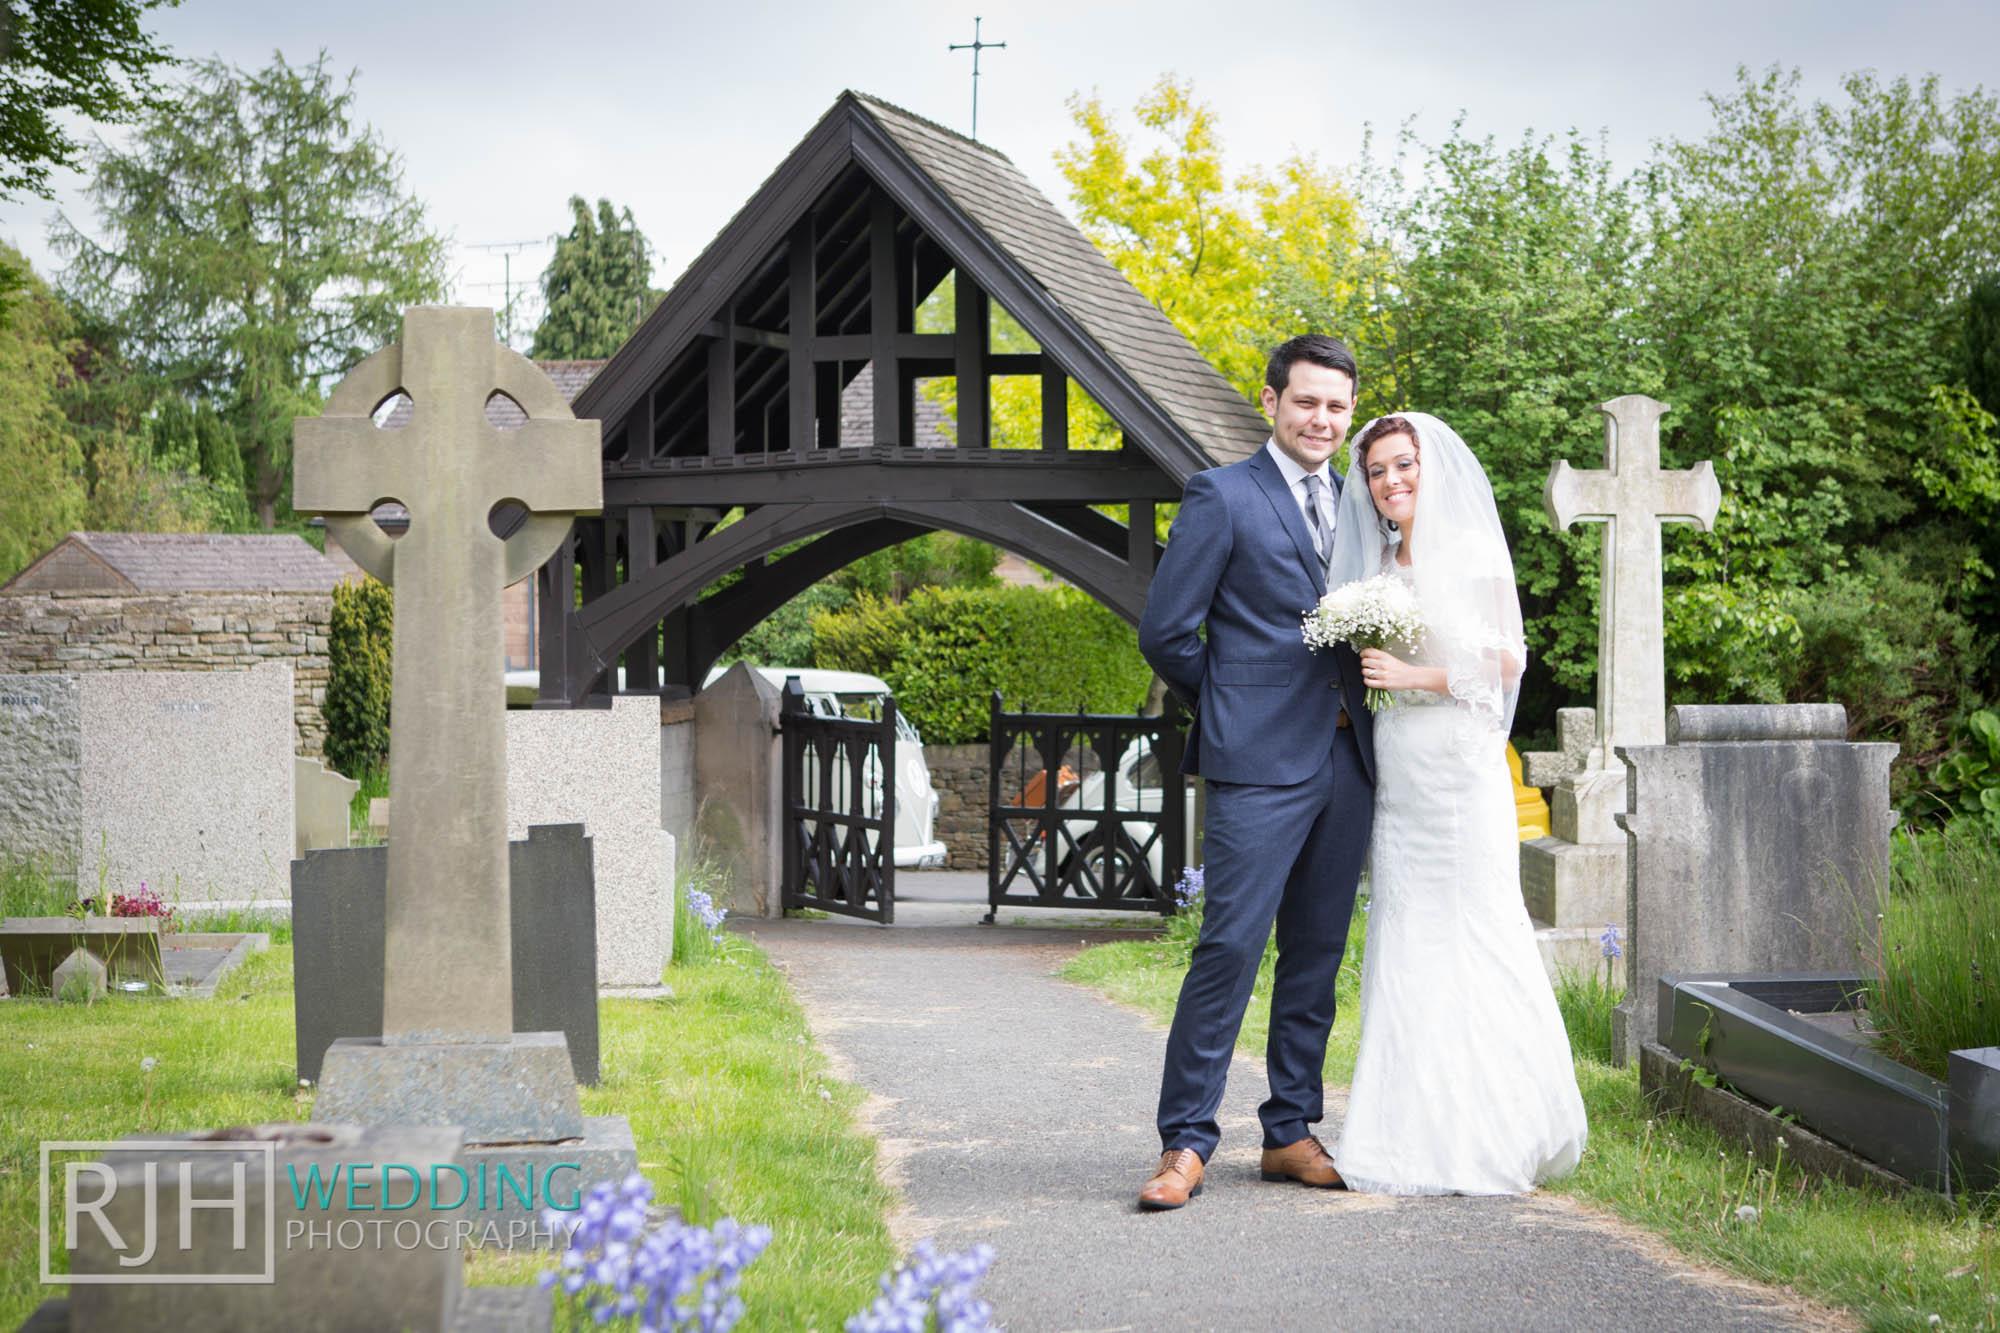 Whitley Hall Marples Wedding_226_3C2A8827.jpg